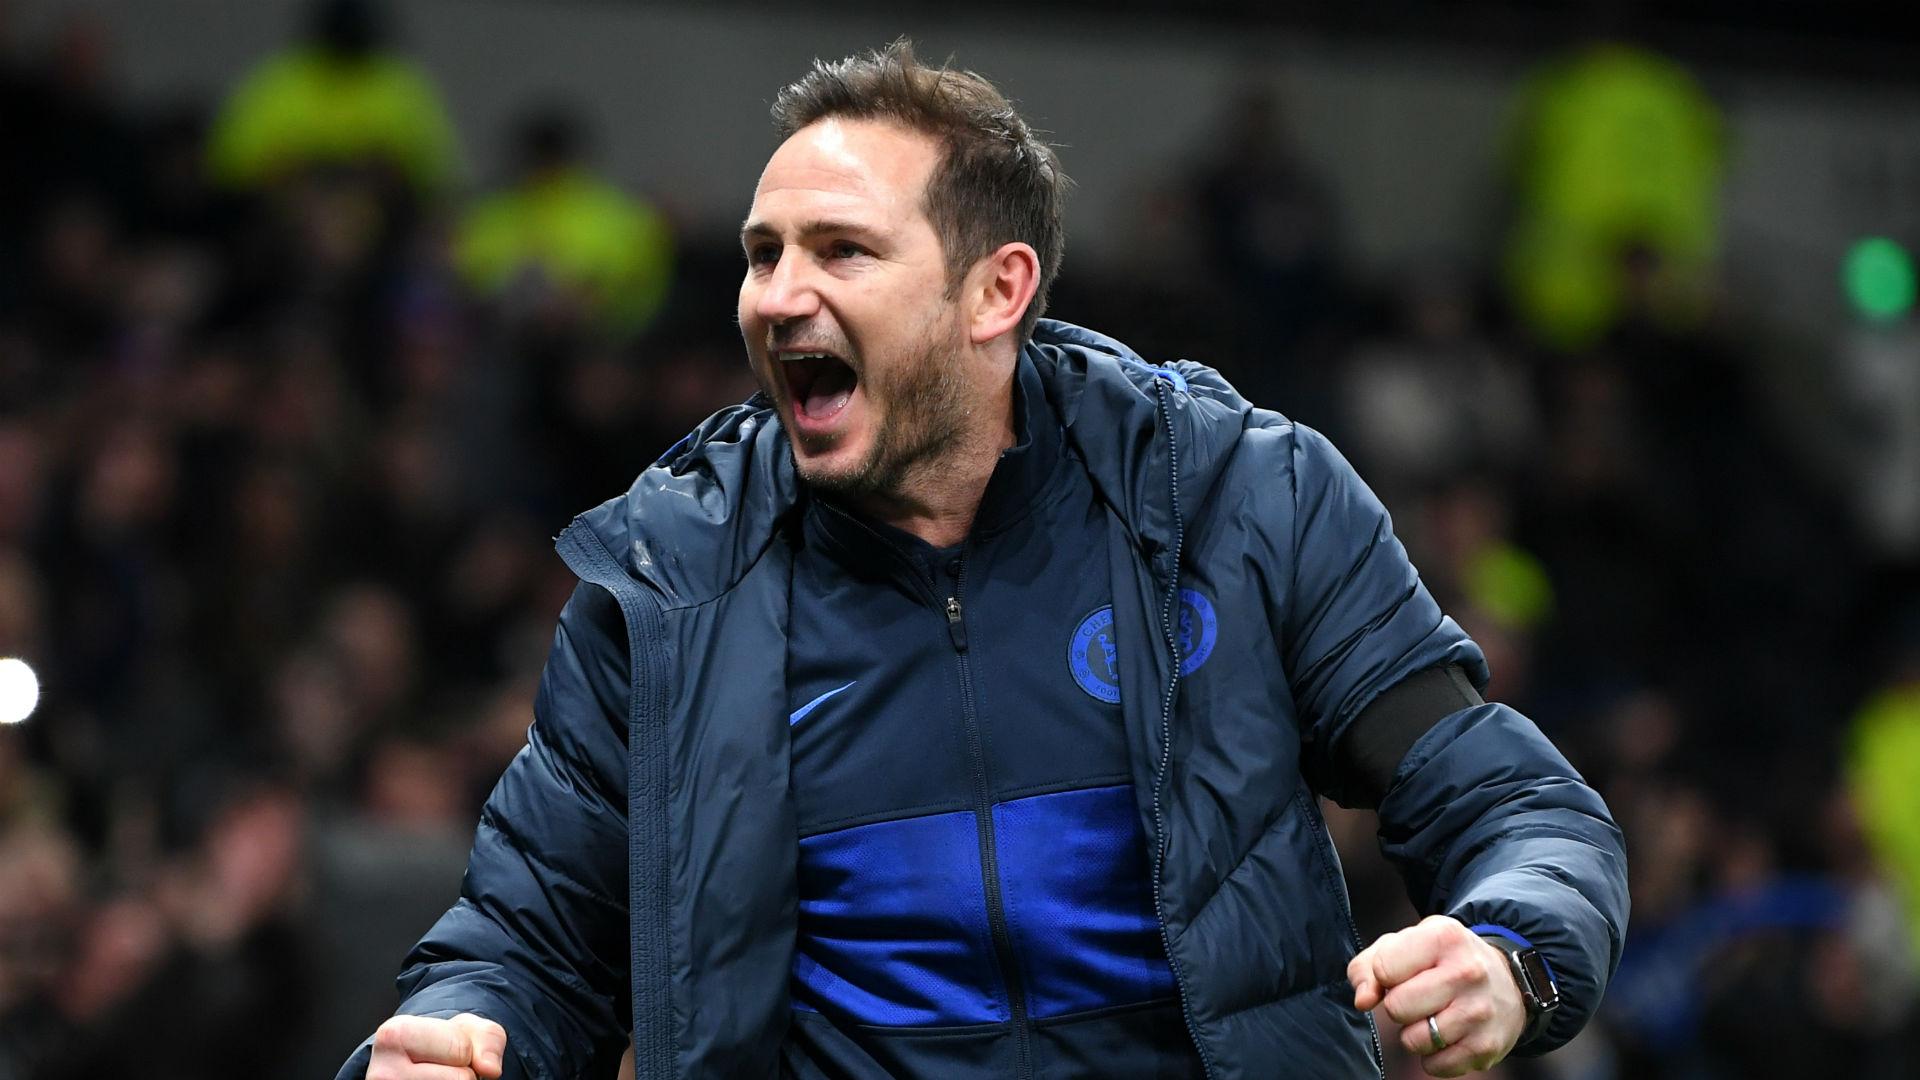 Chelsea boss Lampard out to avoid 'knee-jerk' transfers in January